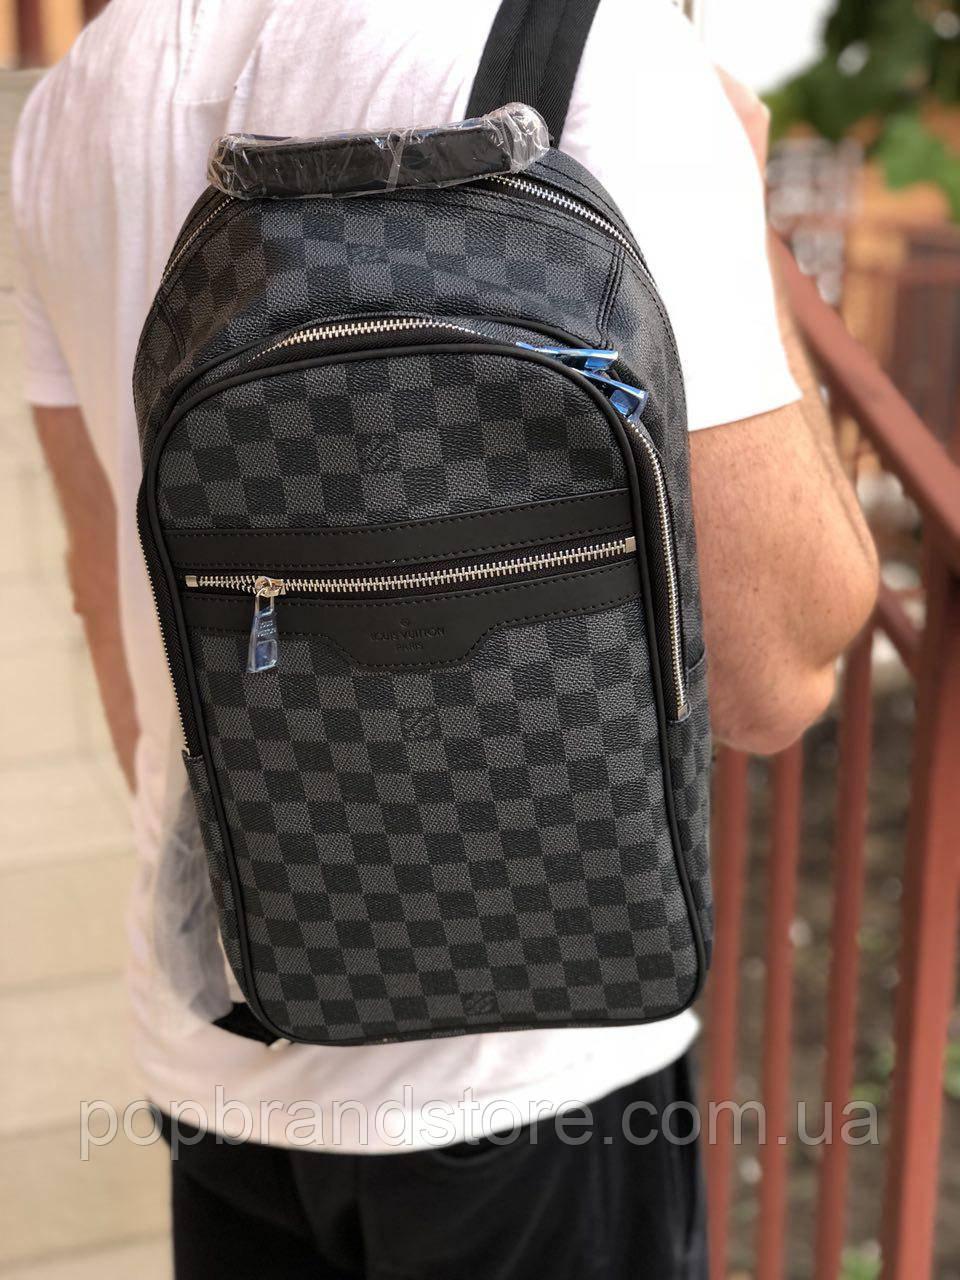 Крутой мужской рюкзак Louis Vuitton MICHAEL (реплика) - Pop Brand Store    брендовые f4cd97c18a6